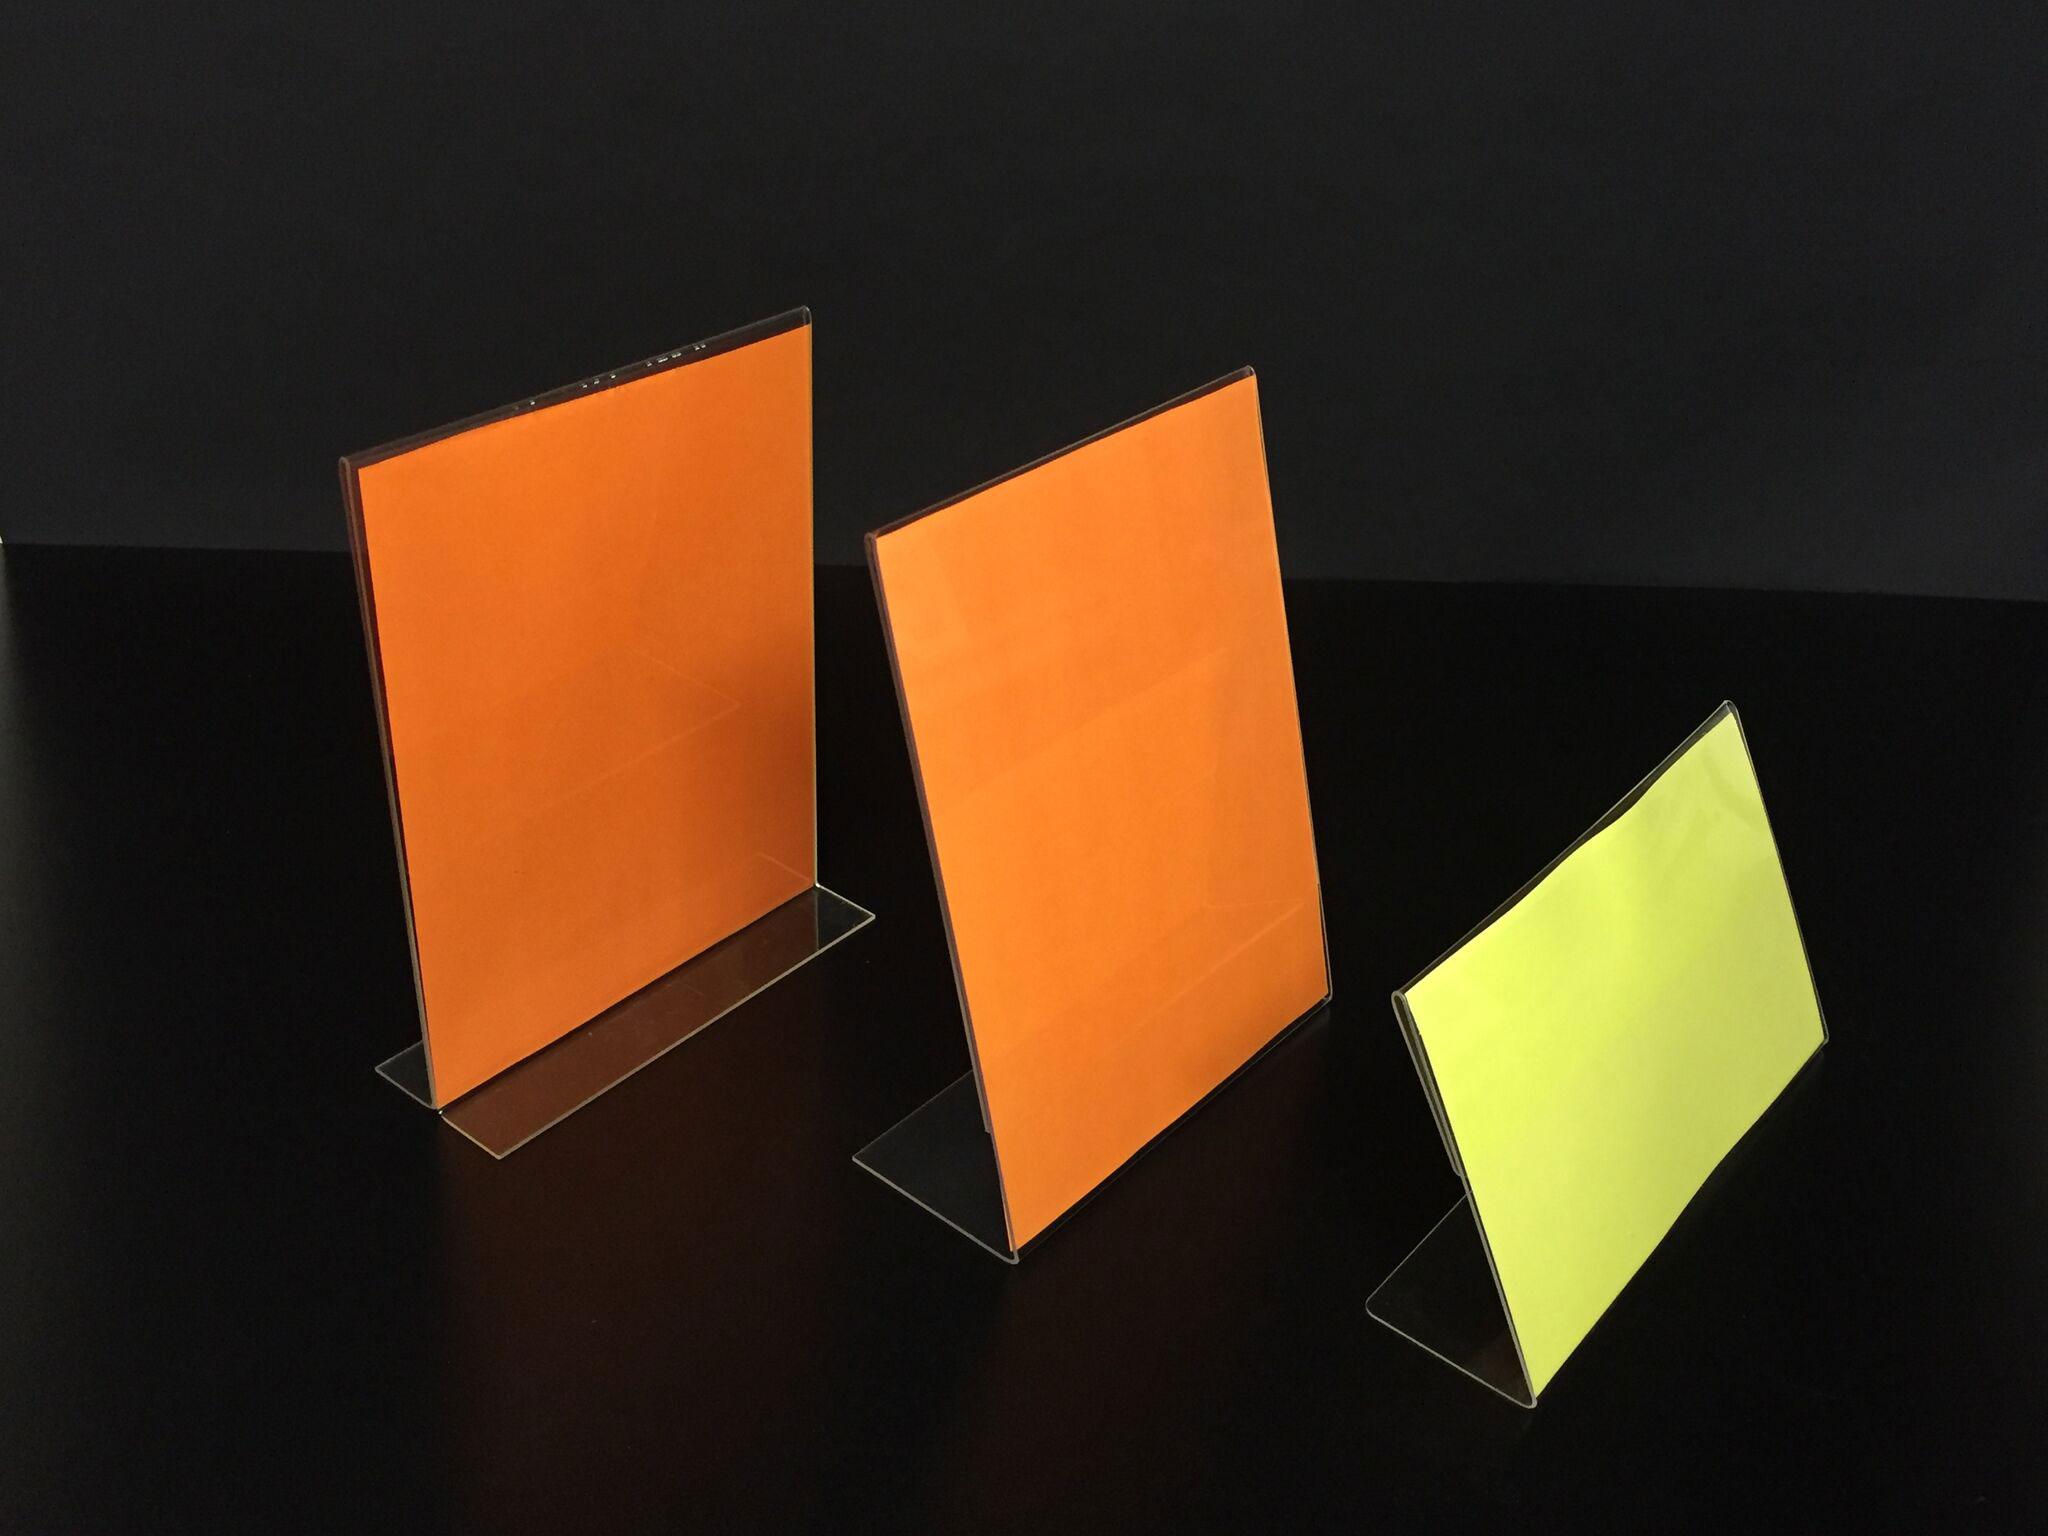 Literature Holders with Orange Paper